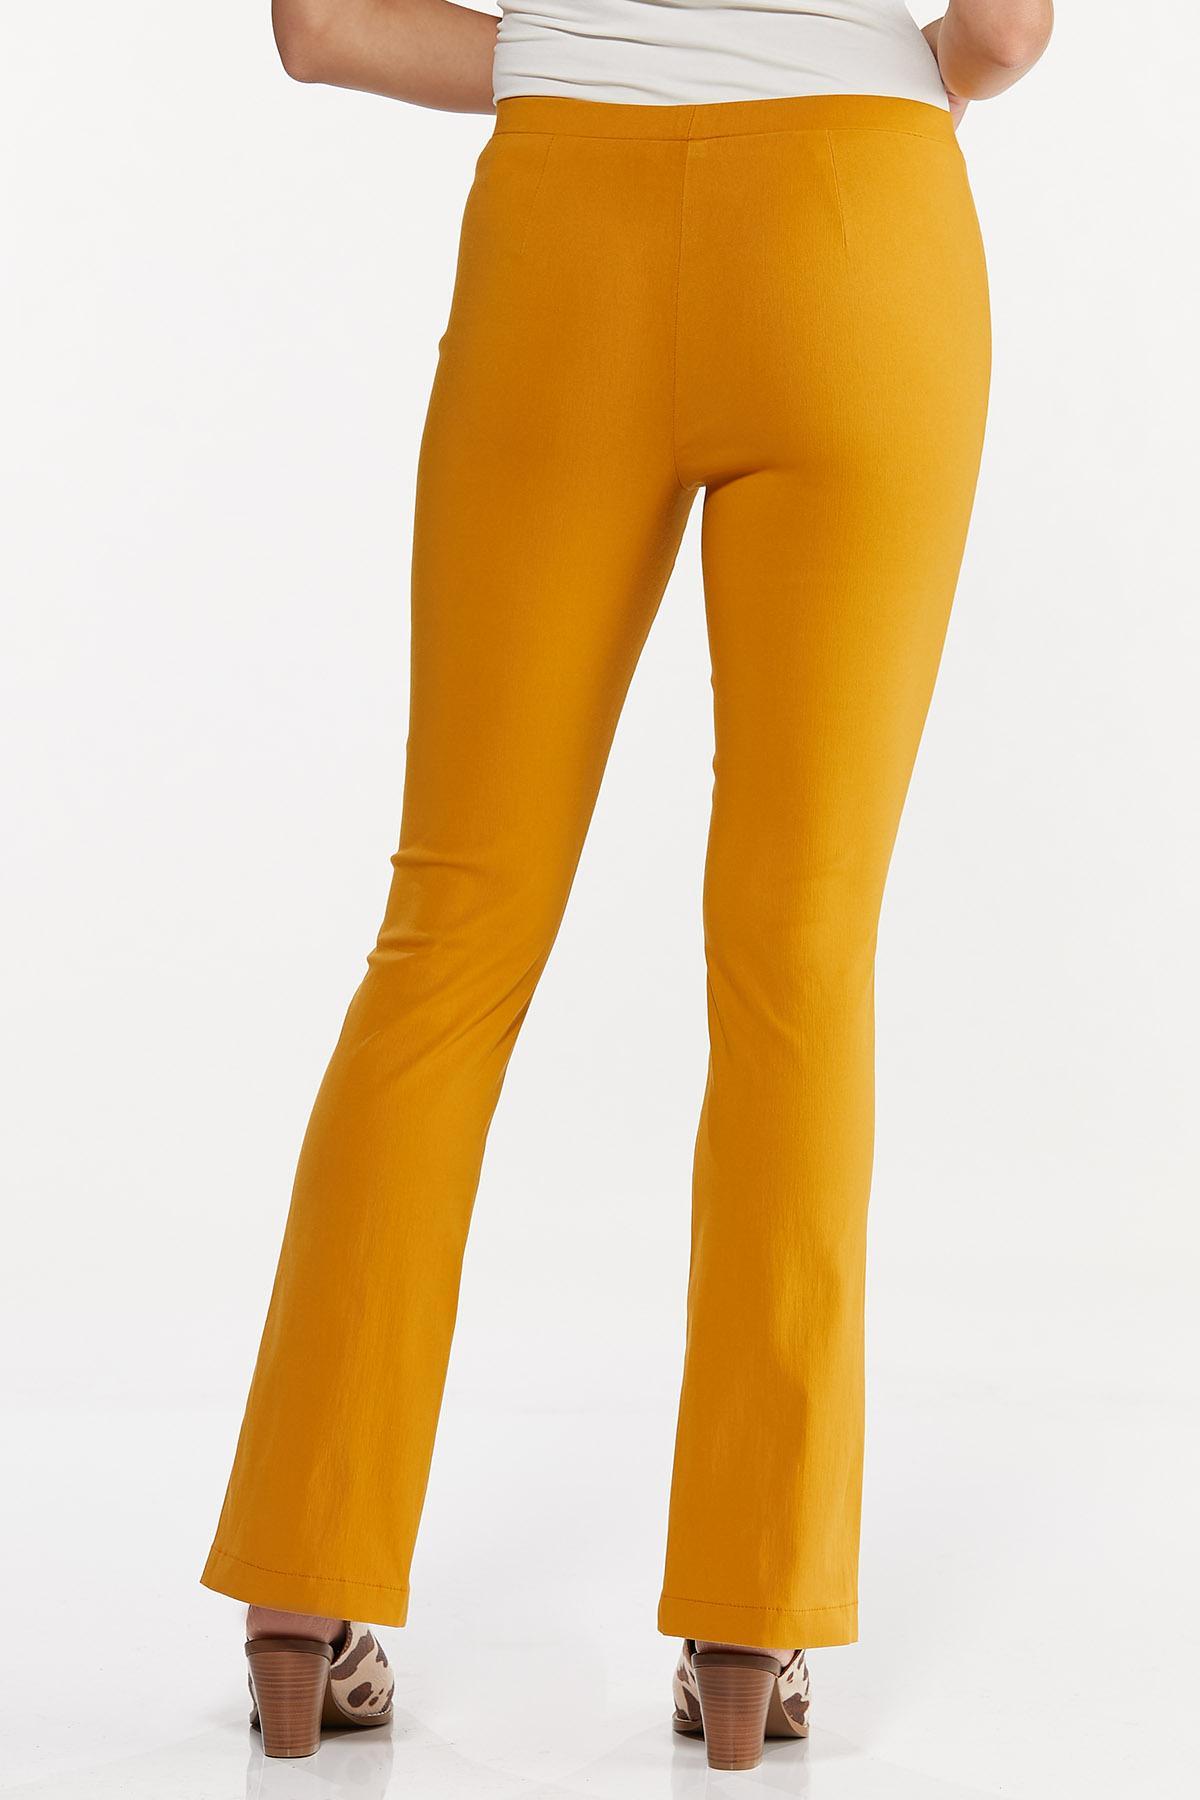 Slit Hem Bootcut Pants (Item #44636893)